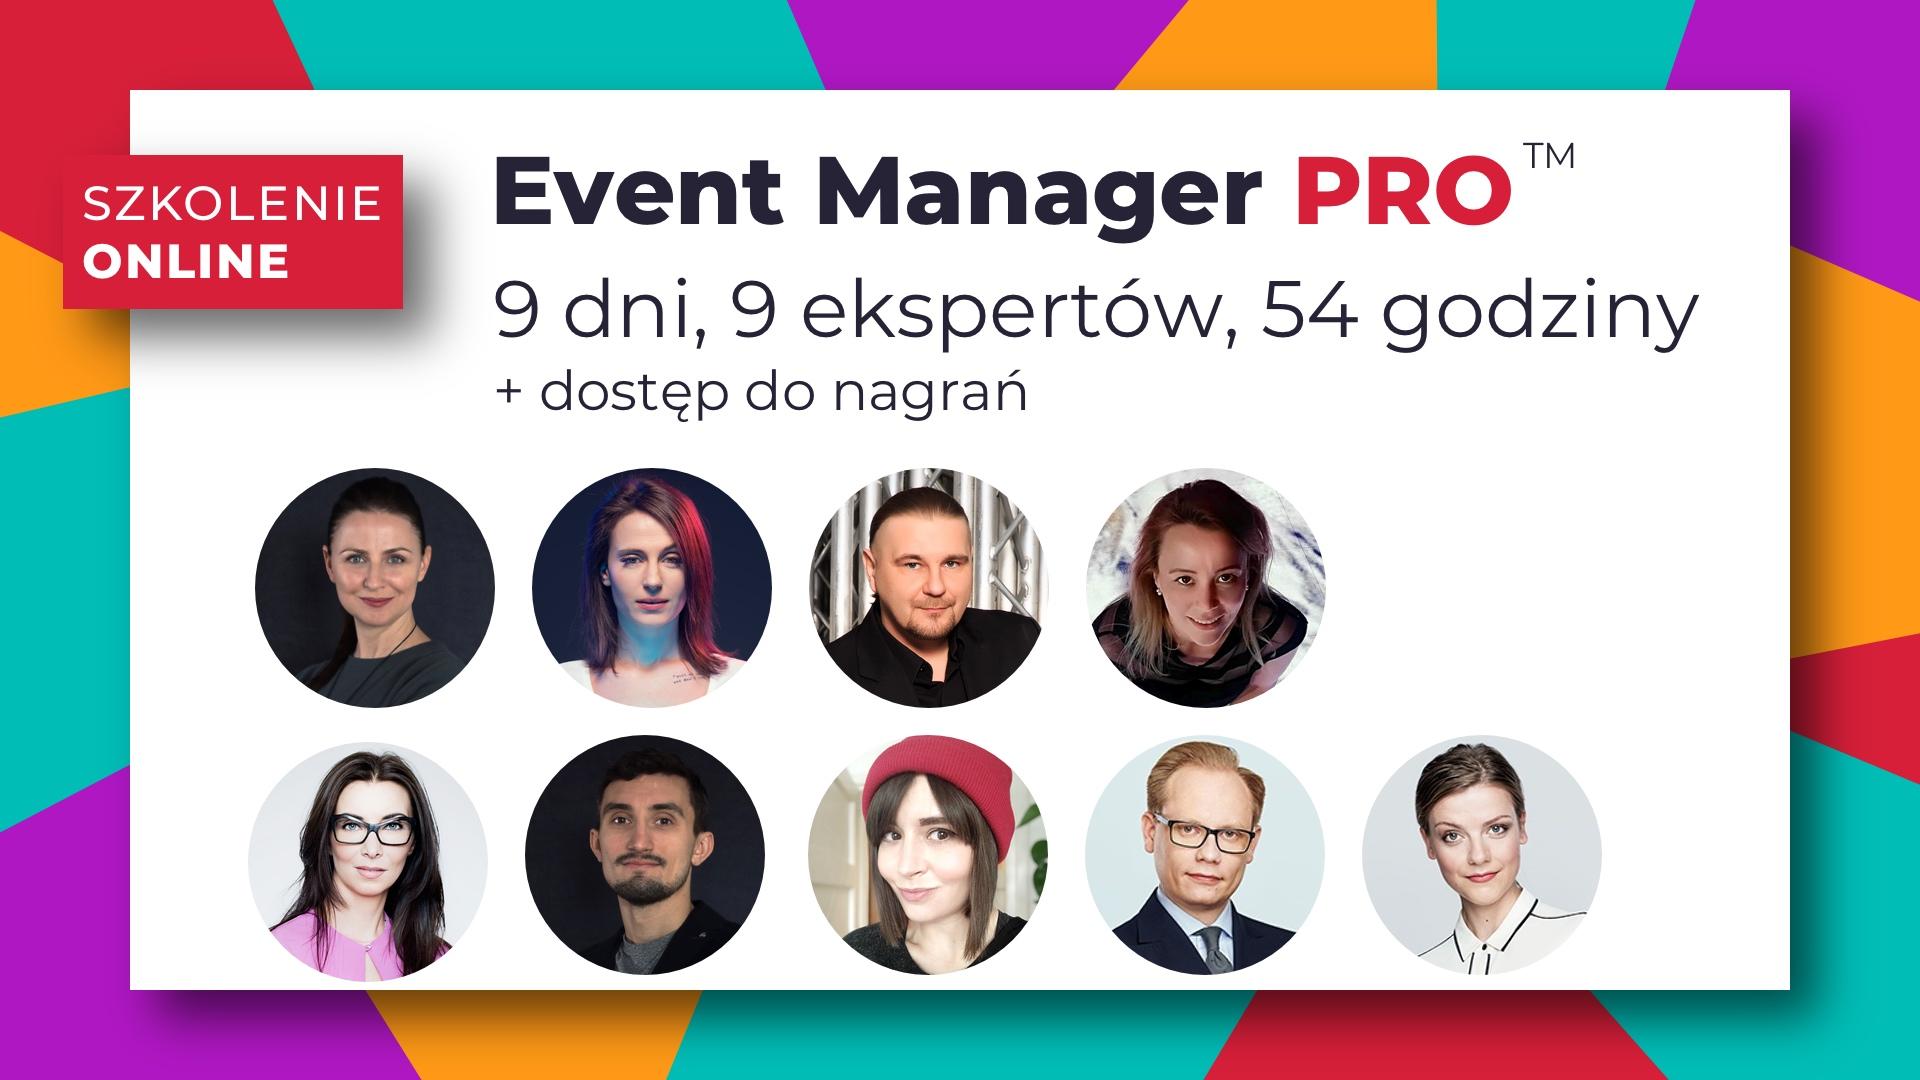 Event Manager PRO szkolenie online nagrania video